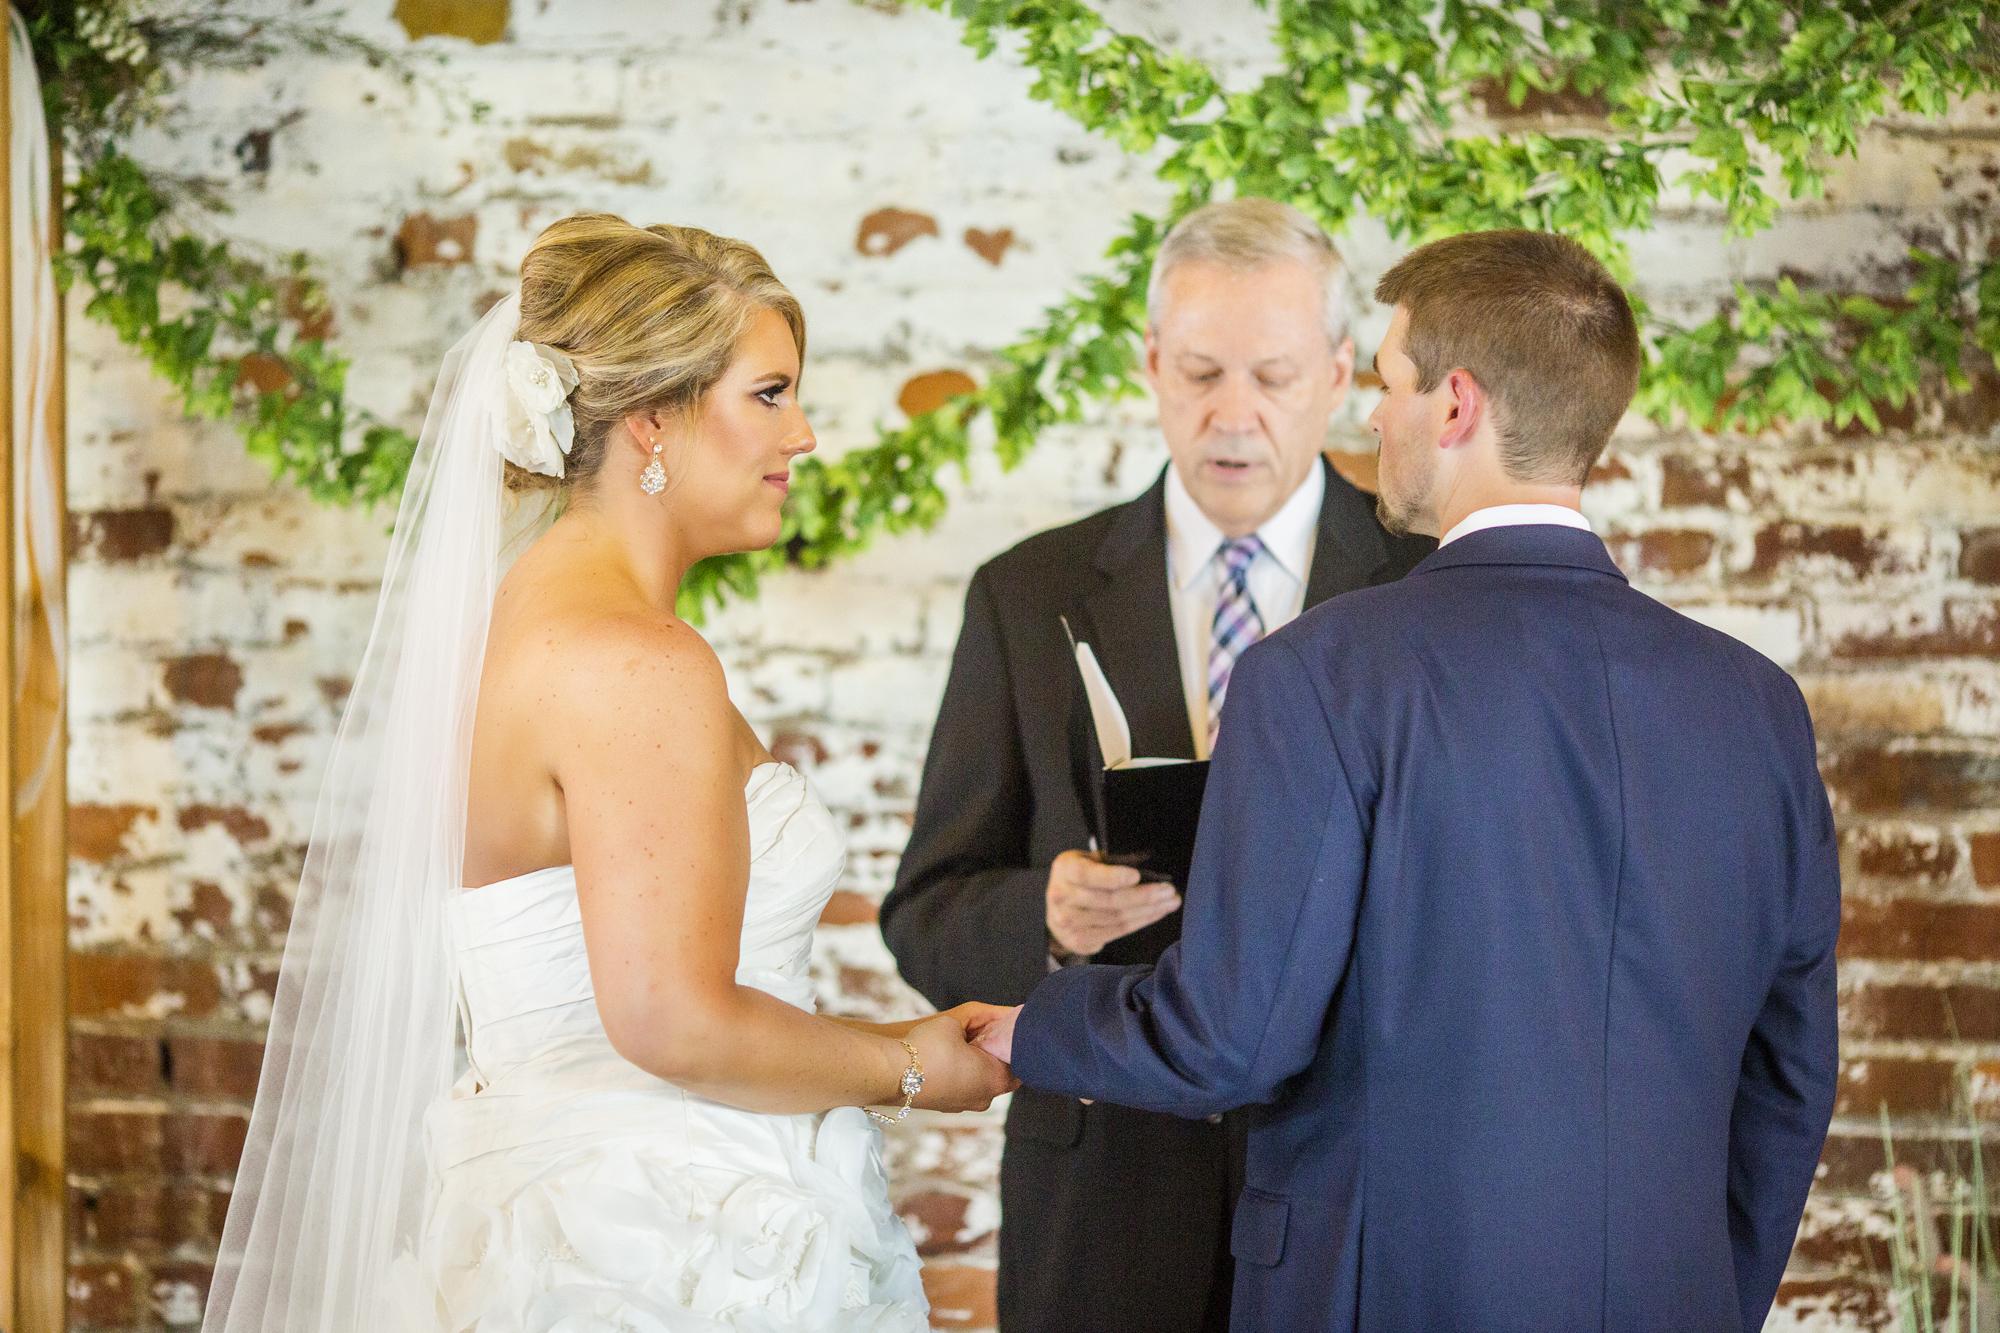 Seriously_Sabrina_Photography_Ashland_Kentucky_Train_Depot_Wedding_Parsons46.jpg